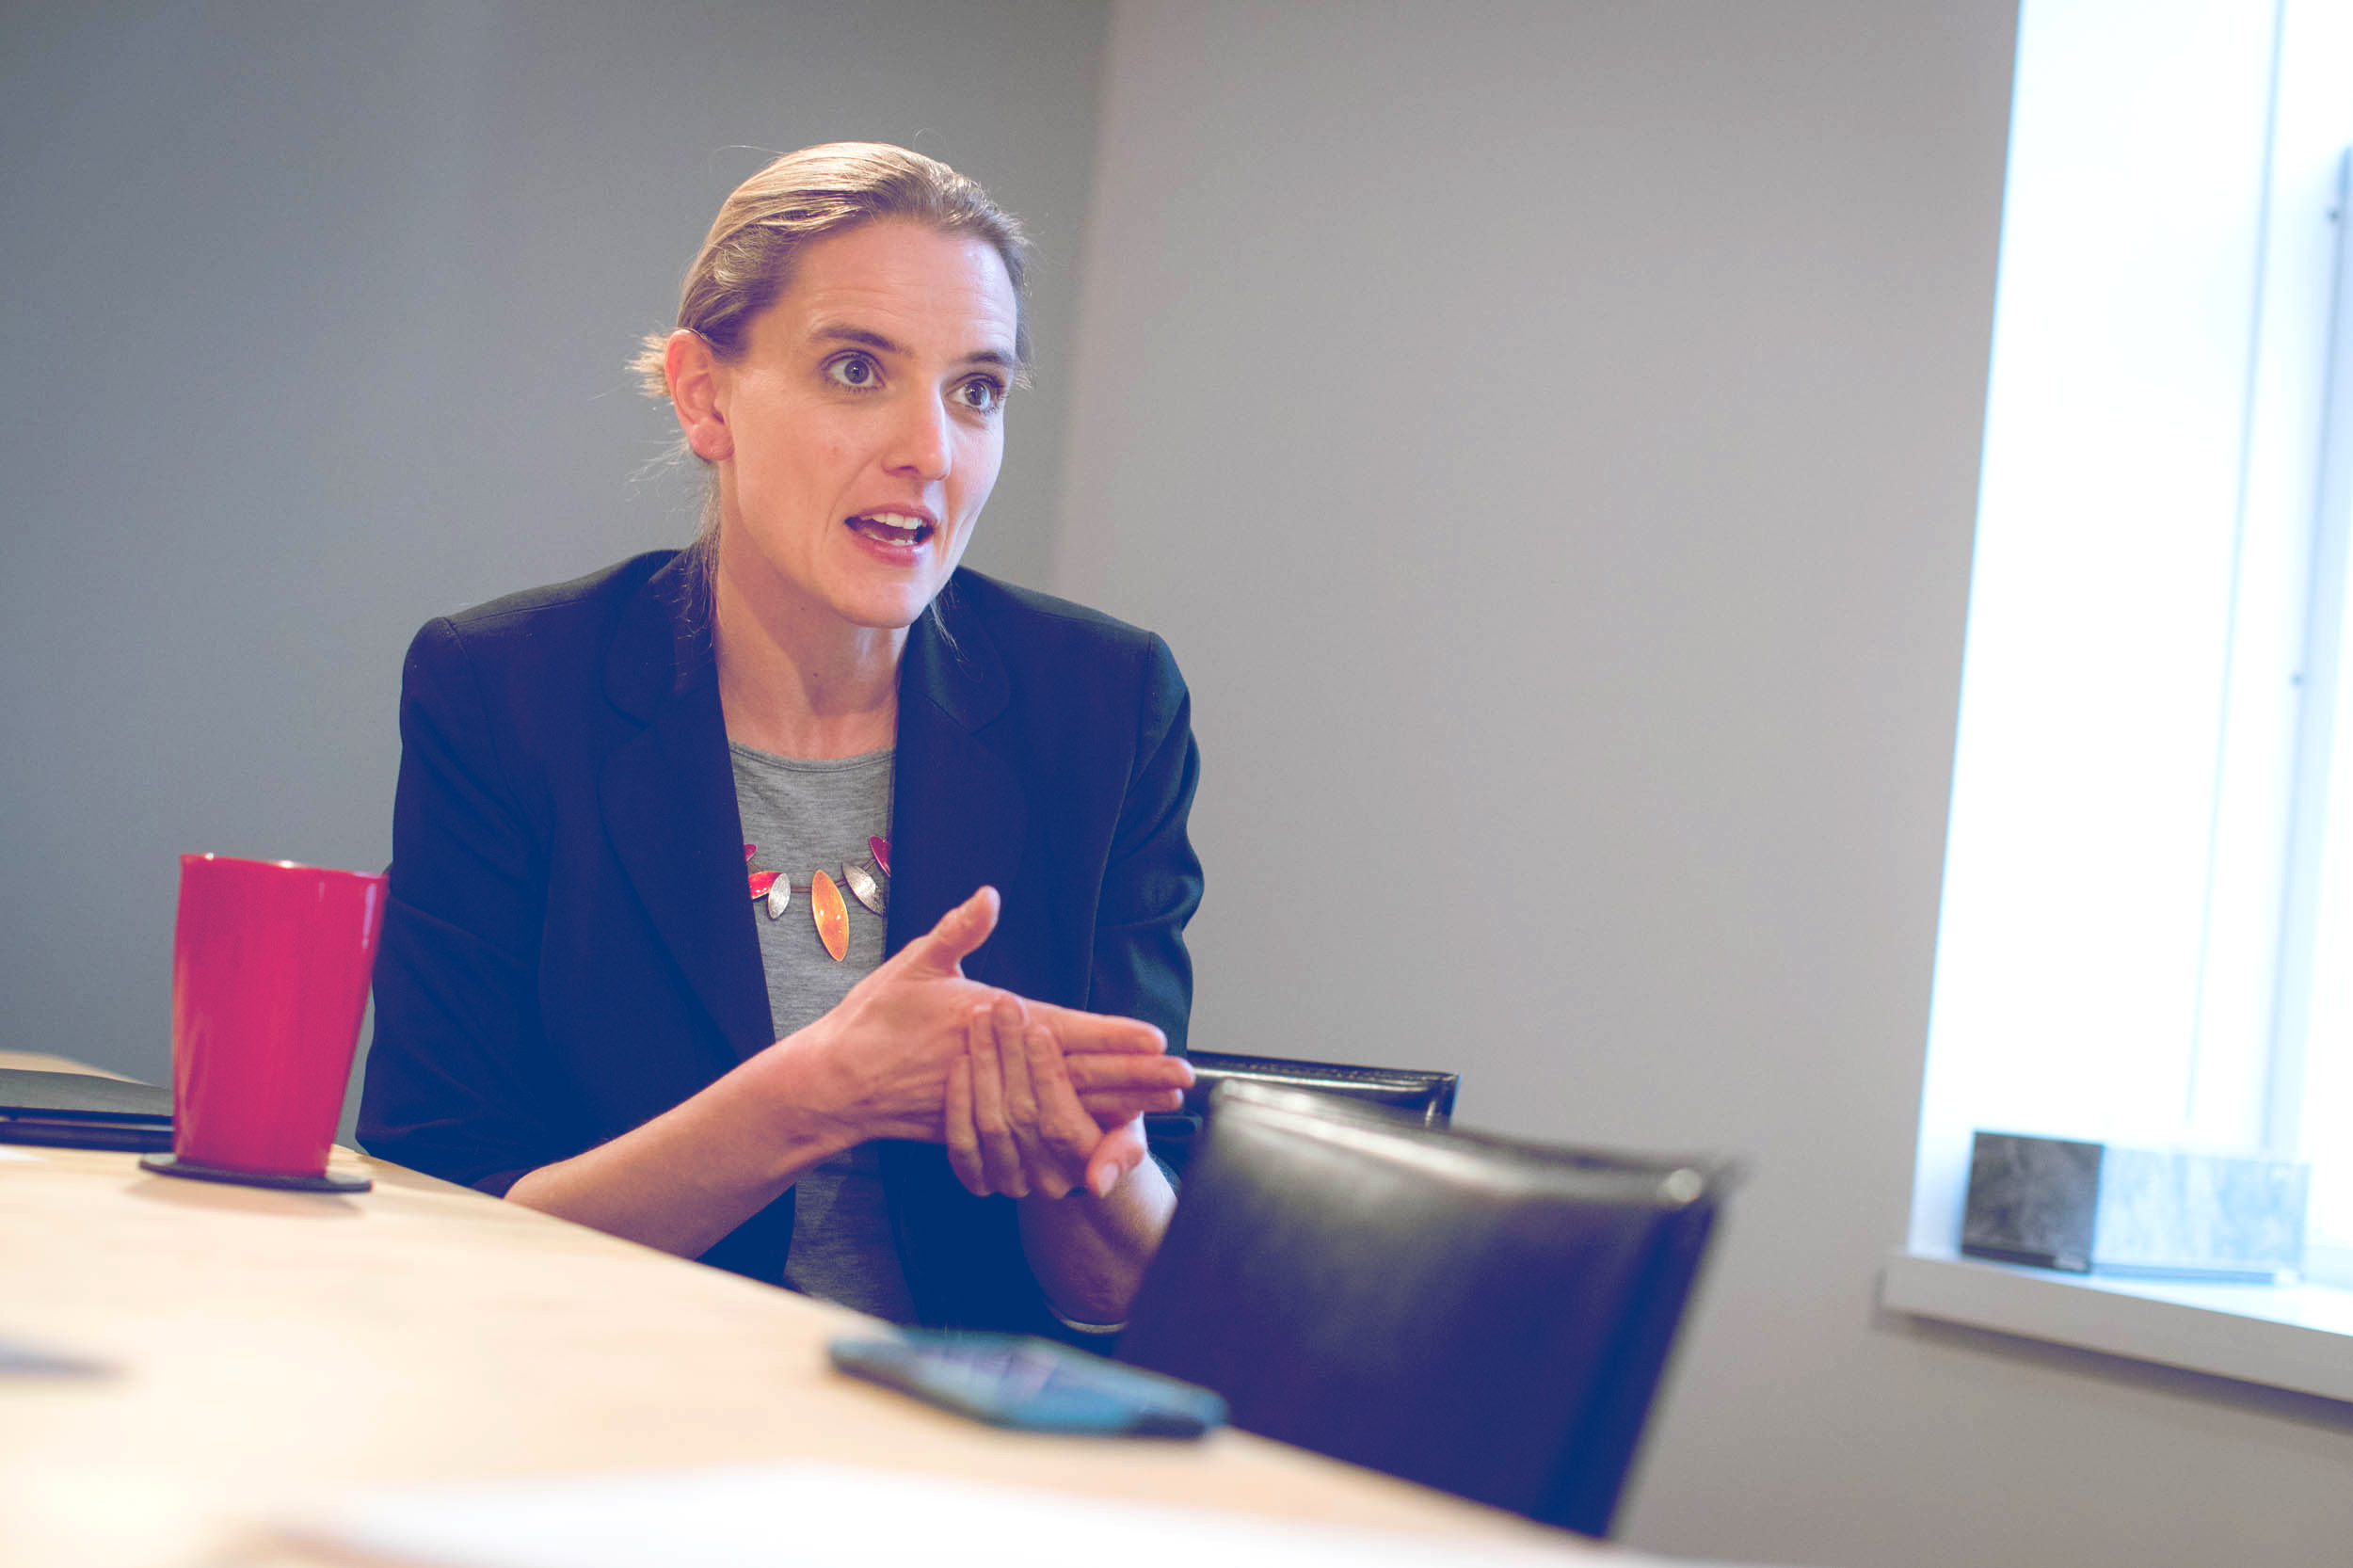 Megan Juelfs-Swanson, Thriving Cities' data analyst, led the Indicator Explorer project. (Photo by Sanjay Suchak, University Communications)